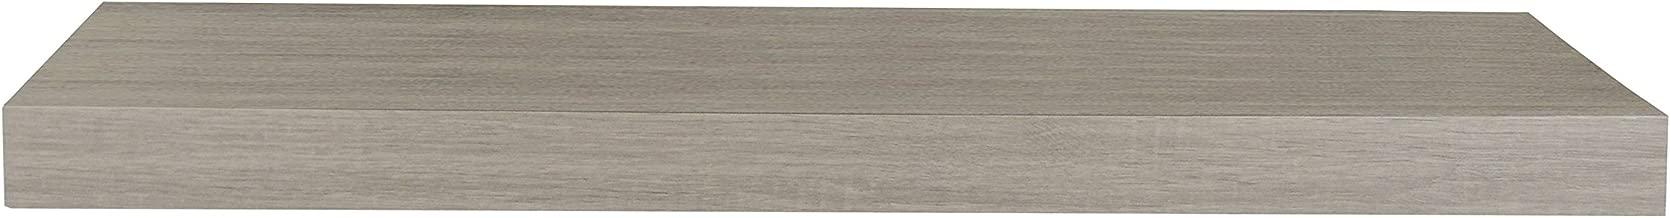 Lewis Hyman 0191903 InPlace Floating Shelf, Driftwood